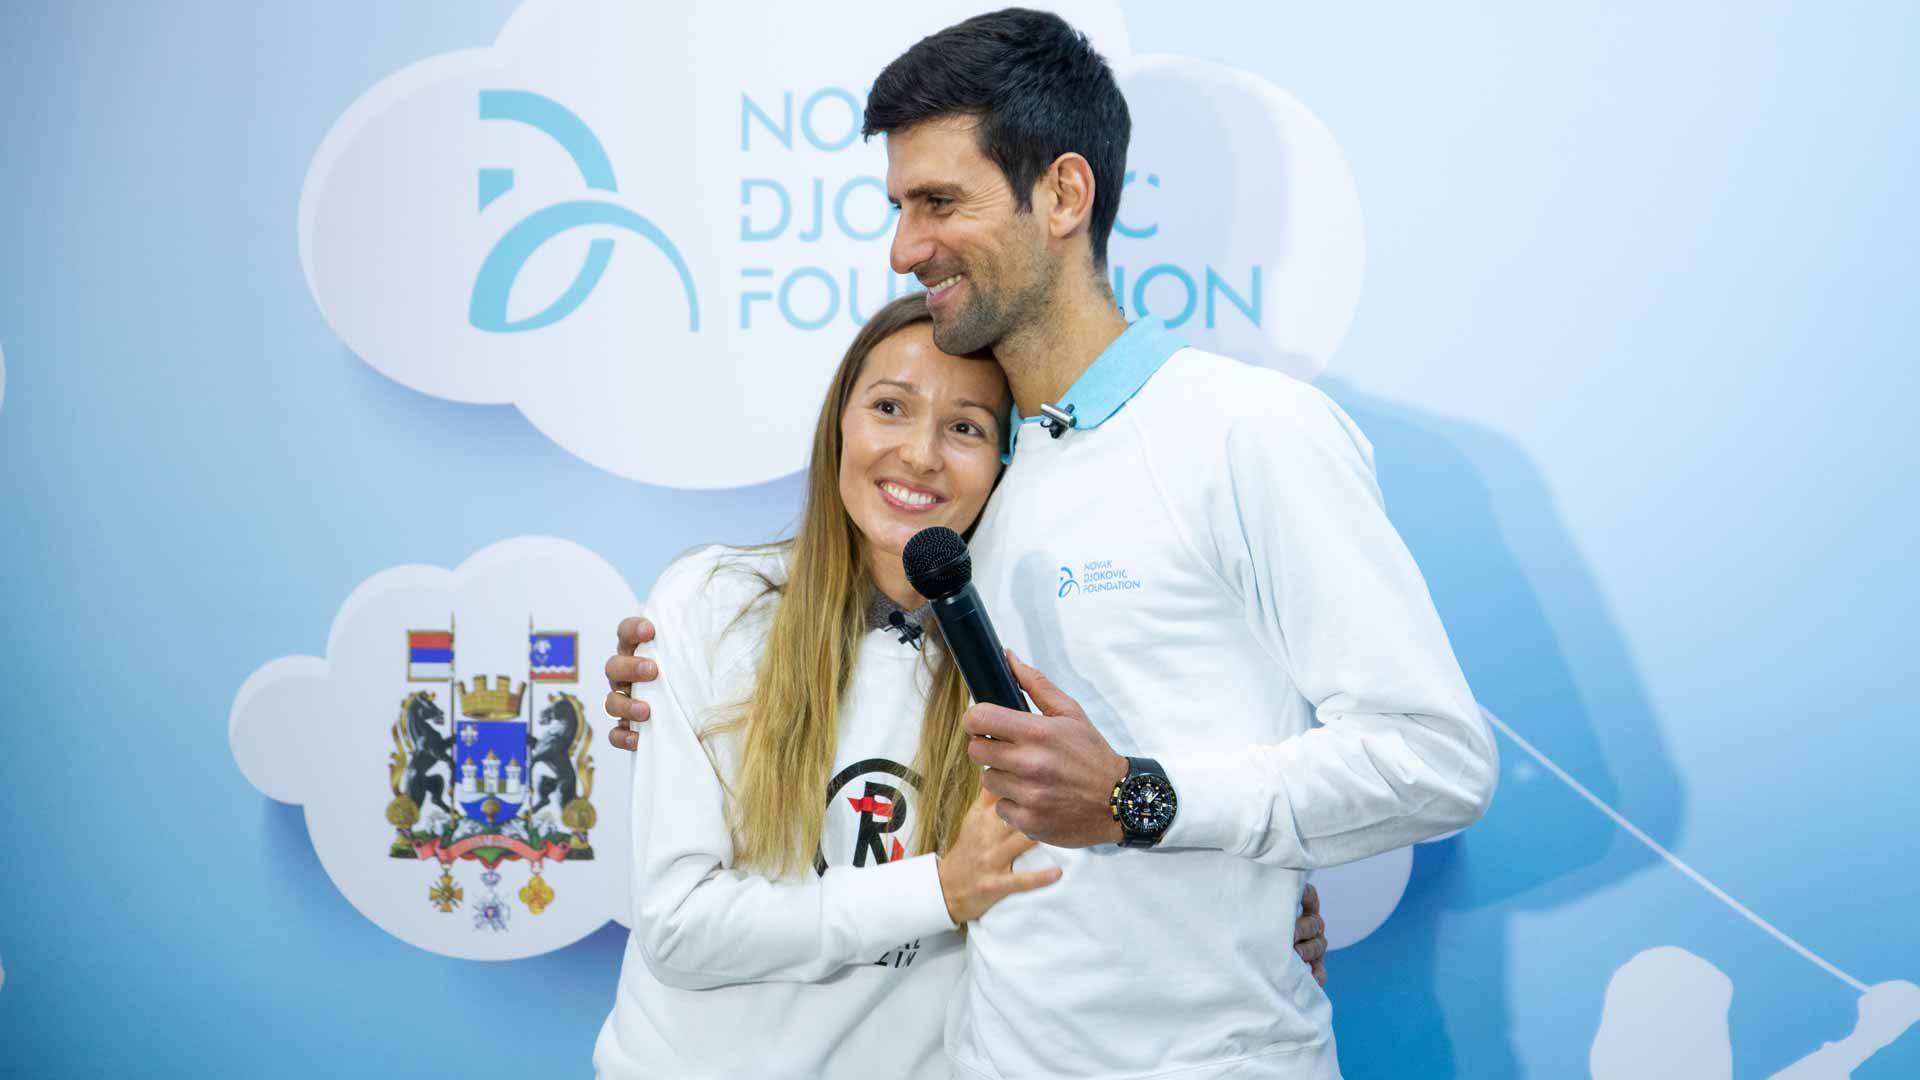 Novak Djokovic on Twitter: